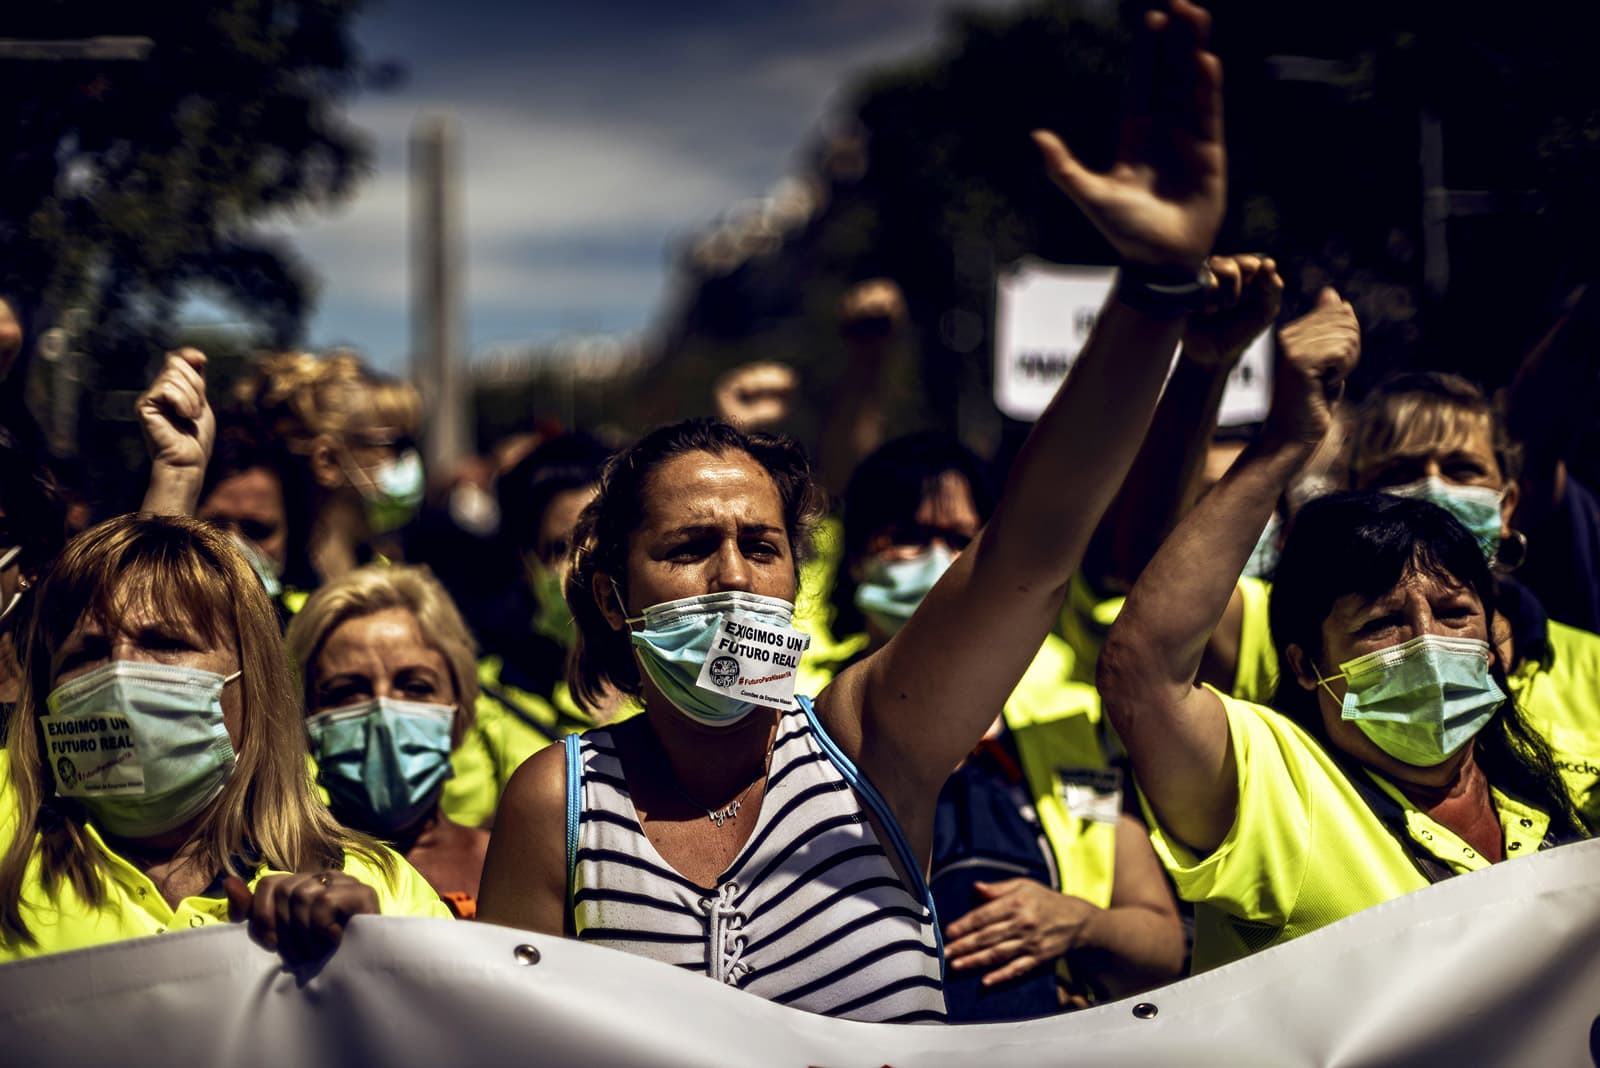 Treballadors de Nissan es manifesten a Barcelona, el 18 de juny, contra el tancament de la planta. Fotografia de Matthias Oesterle. Zuma Wire